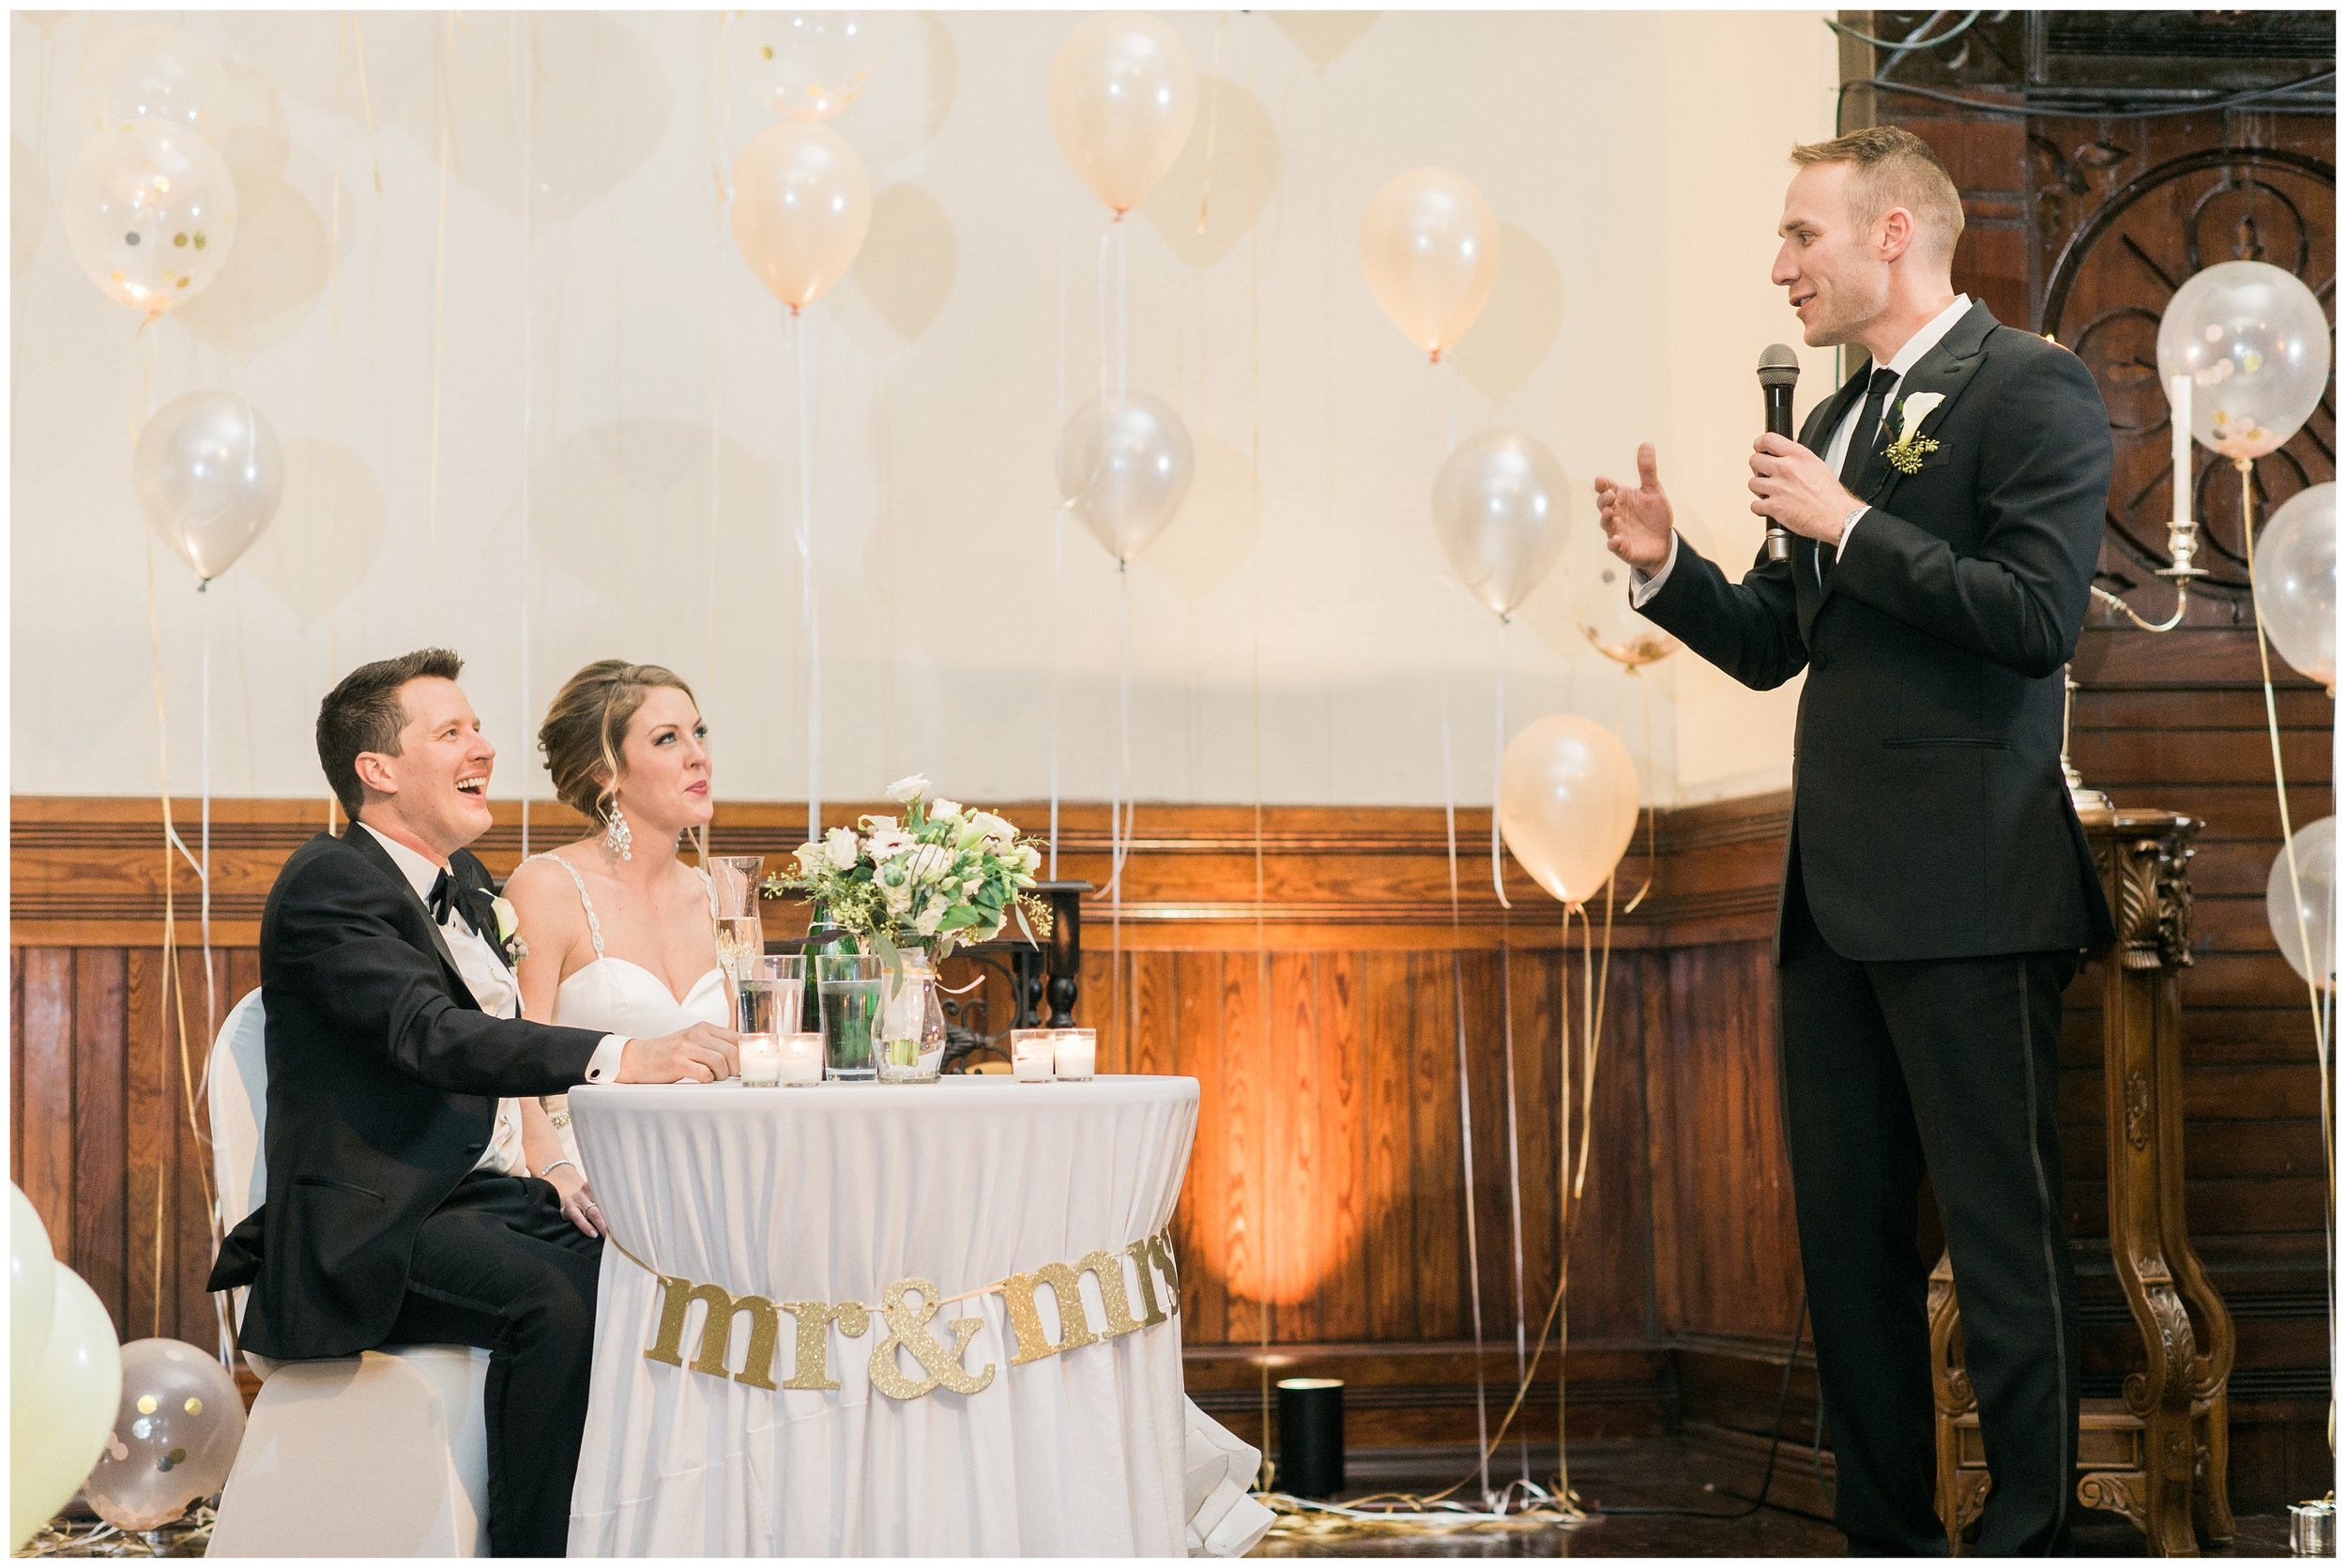 Rebecca_Bridges_Photography_Indianapolis_Wedding_Photographer_5845.jpg